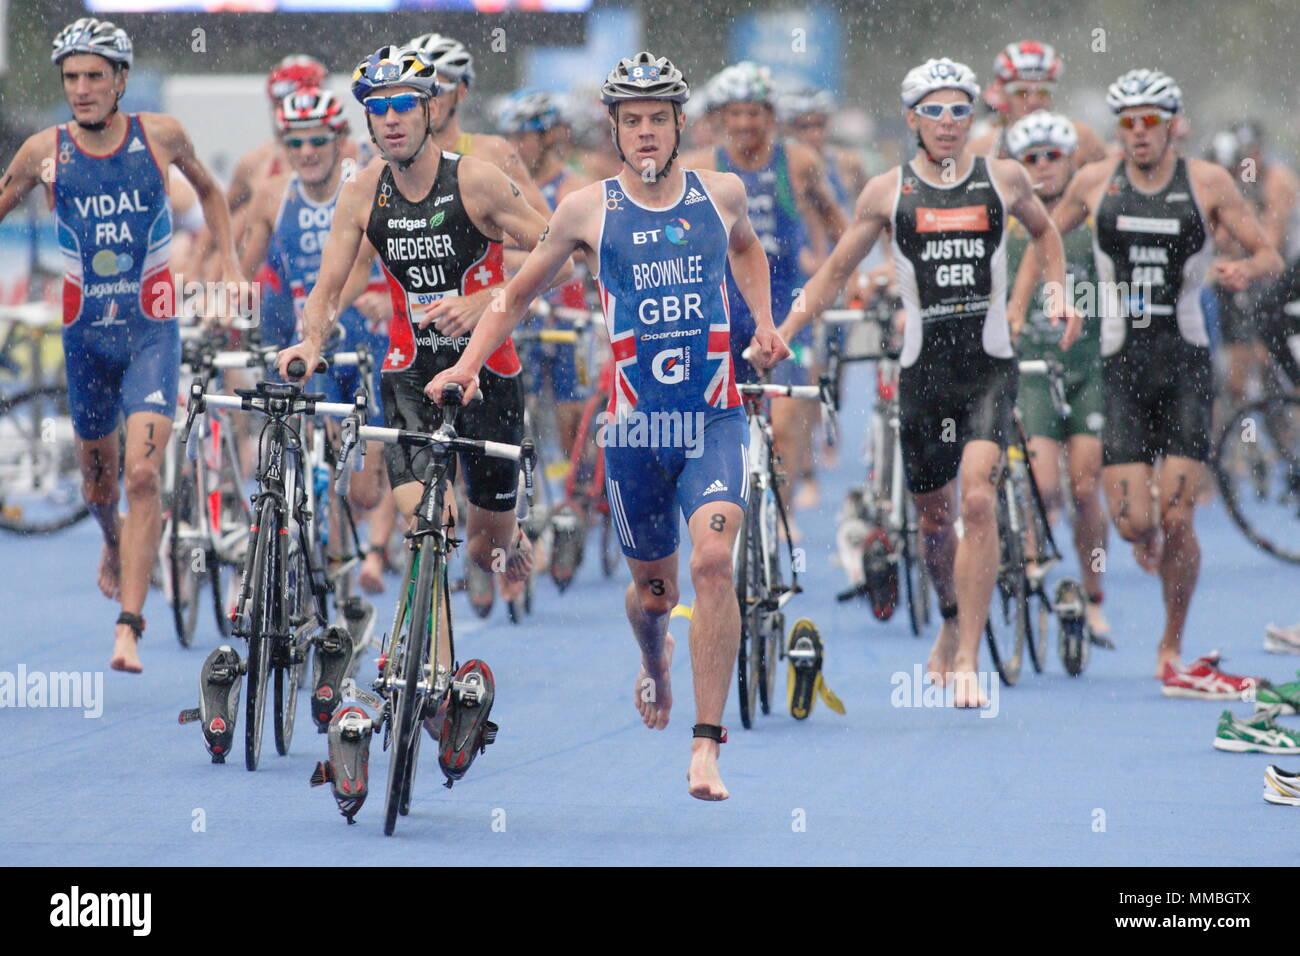 UK - Triathlon - Transition - Elite Men ITU World Championship Dextro Energy Triathlon London, 7 August 2011 - Stock Image